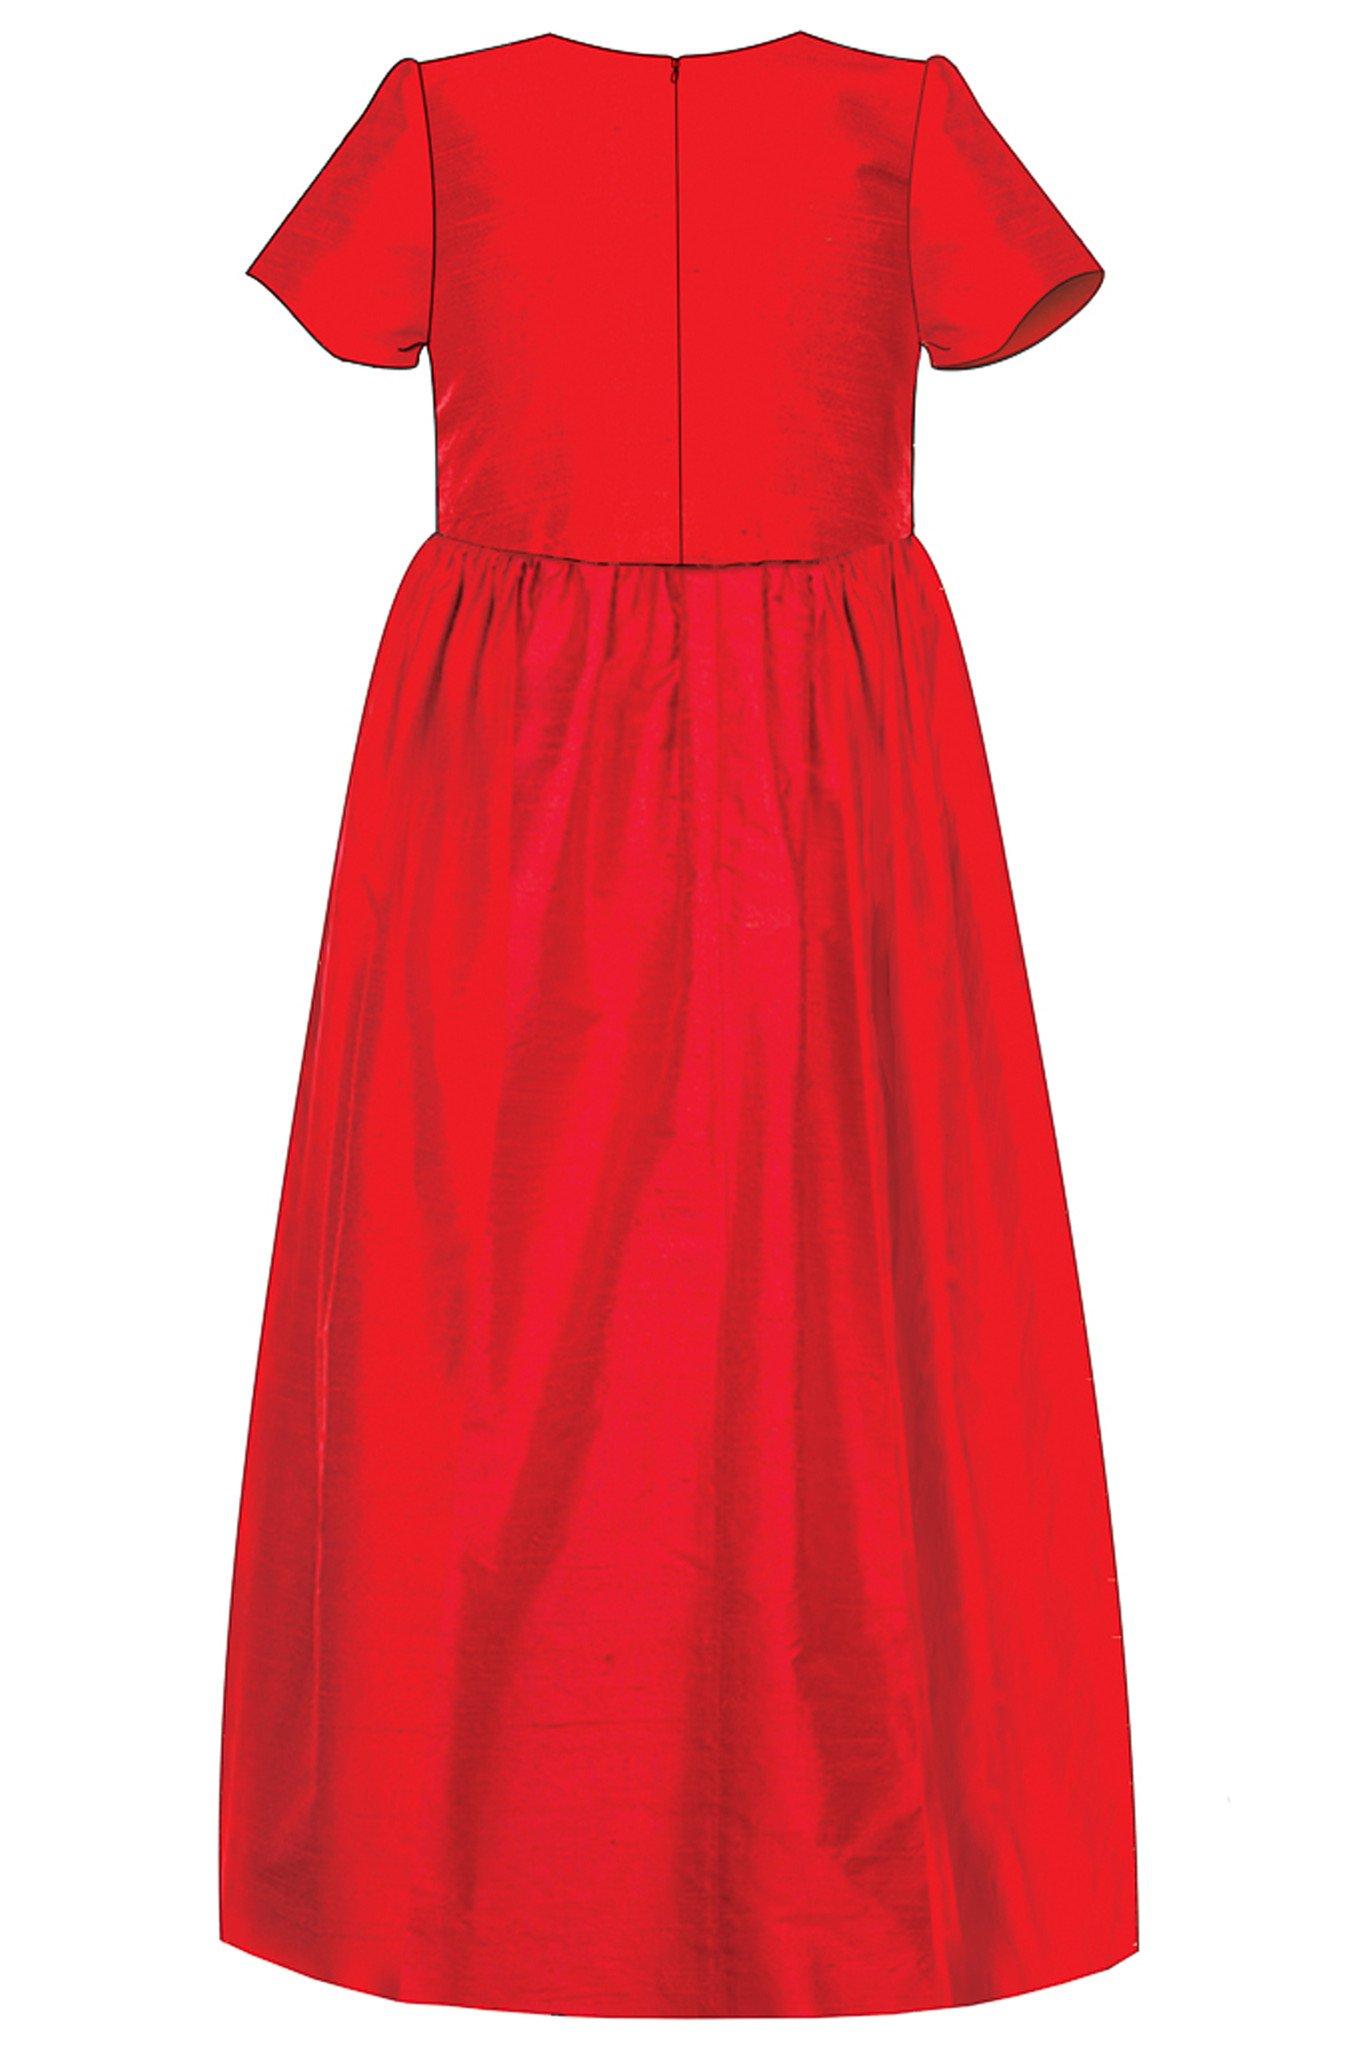 1365x2048 lazy francis red raw silk girls maxi dress with black lace lazy